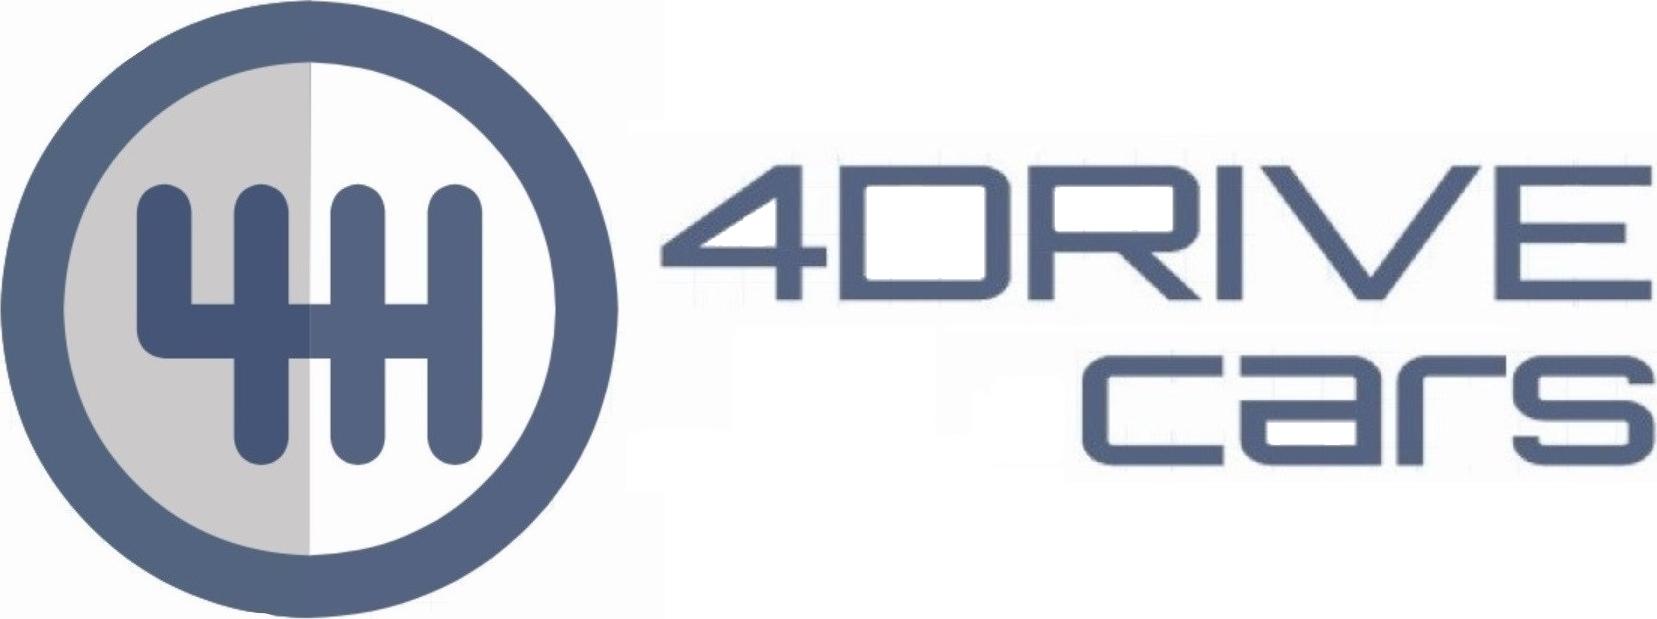 logo-4drivecars-apaisado